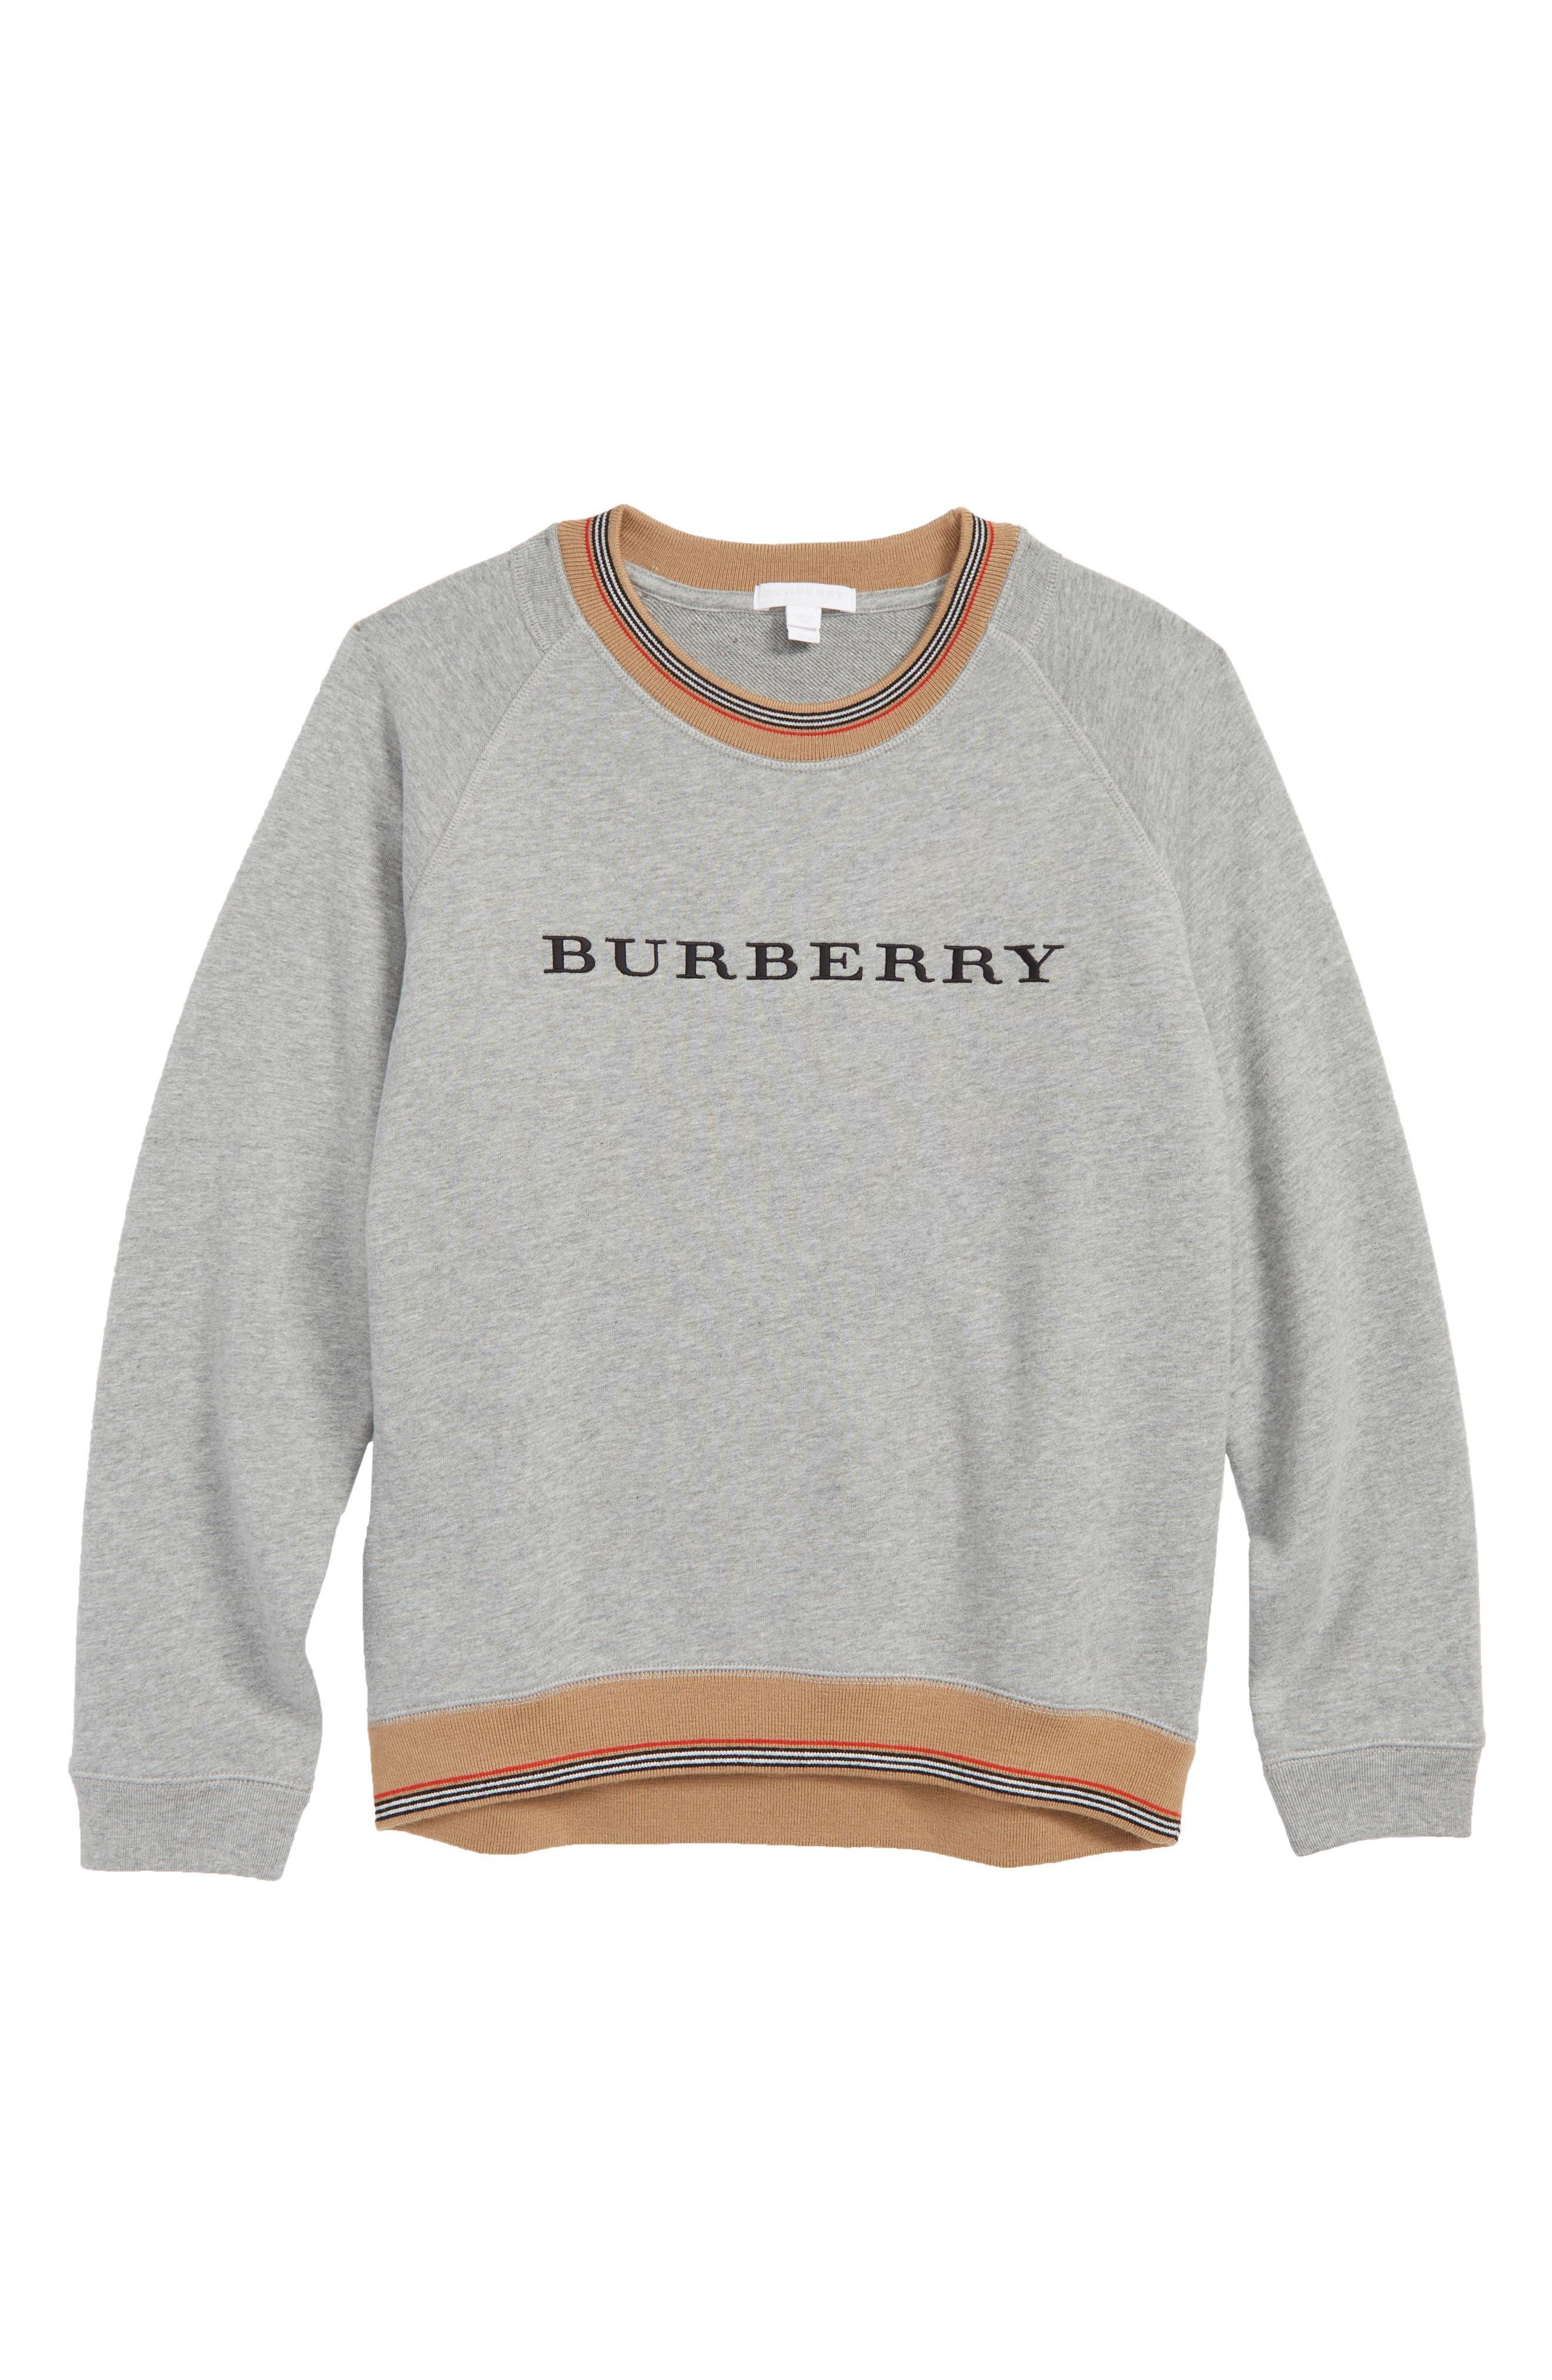 Hectore Stripe Sweater,                             Main thumbnail 1, color,                             GREY MELANGE